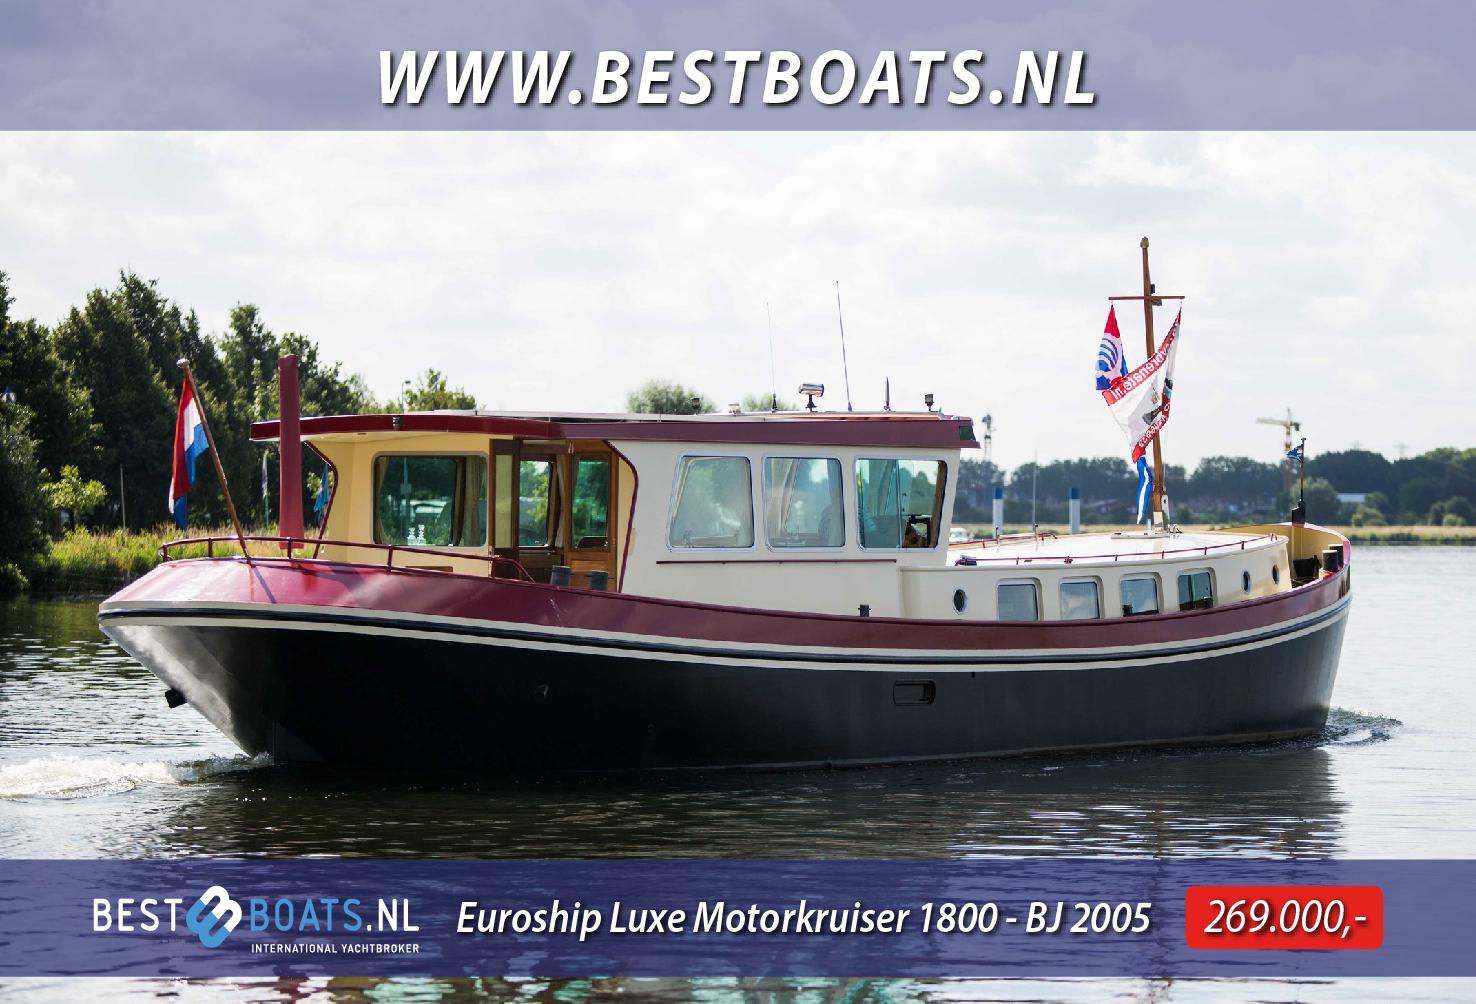 Euroship Luxe Motorkruiser 1800